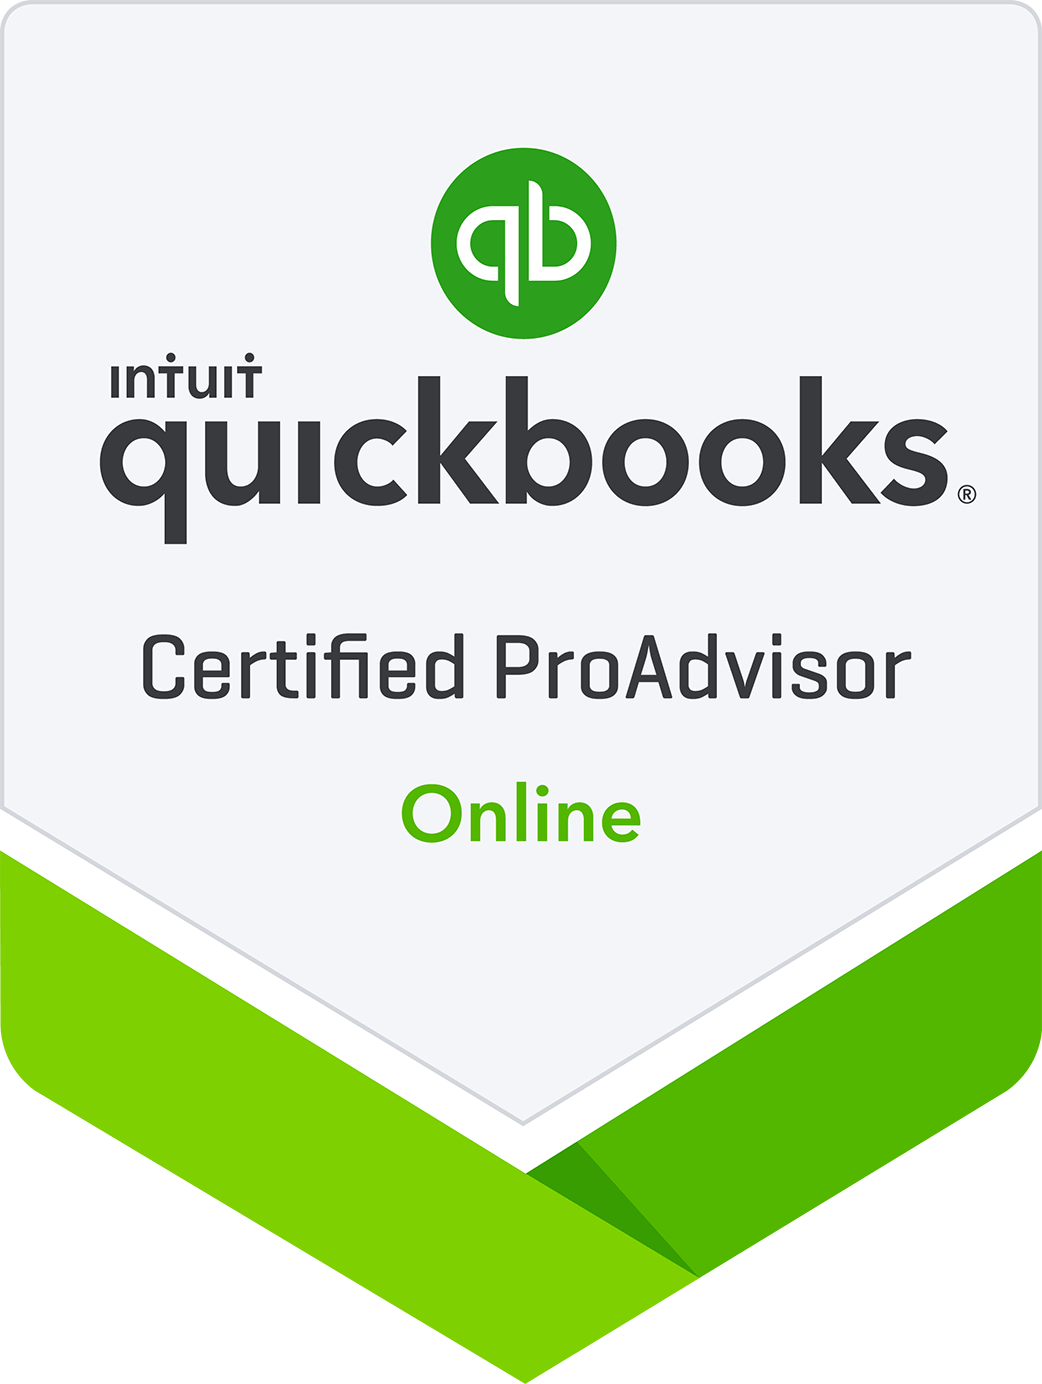 Certified QuickBooks Online Proadvisor in New York, Long Island, Nassau & Suffolk Counties, Queens, and Brooklyn